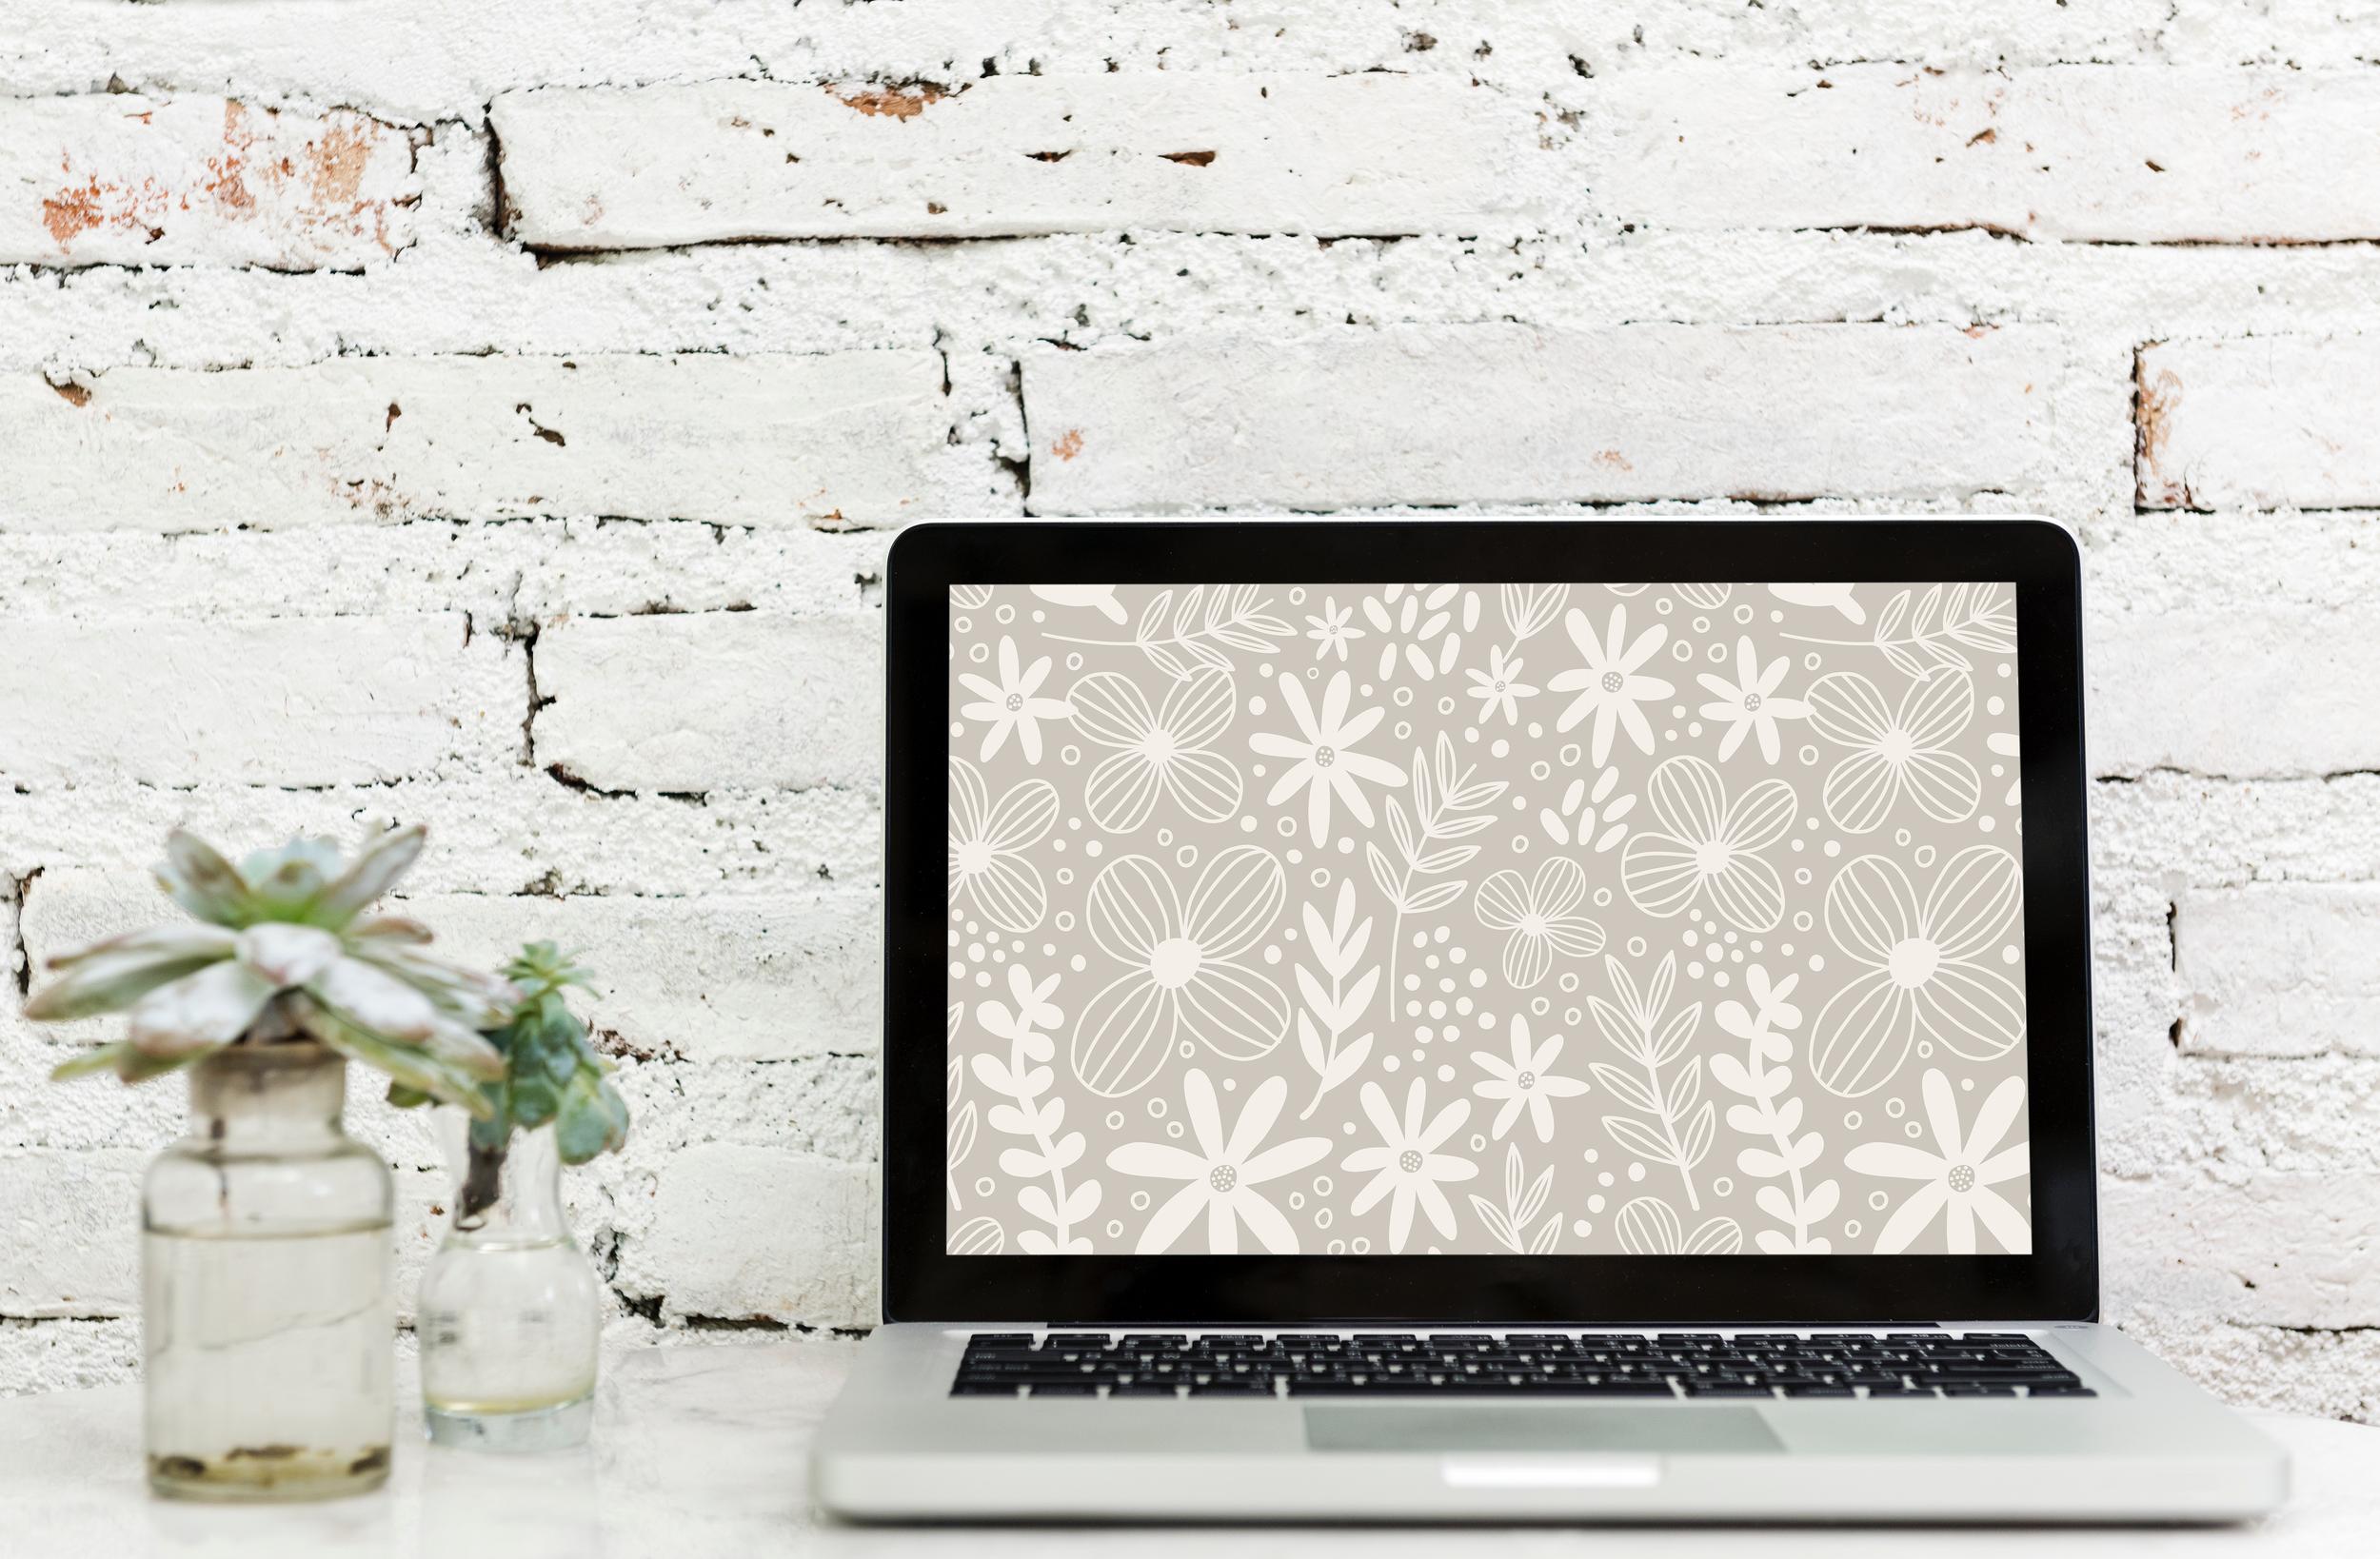 Free Desktop Wallpaper designs by Pace Creative Design Studio